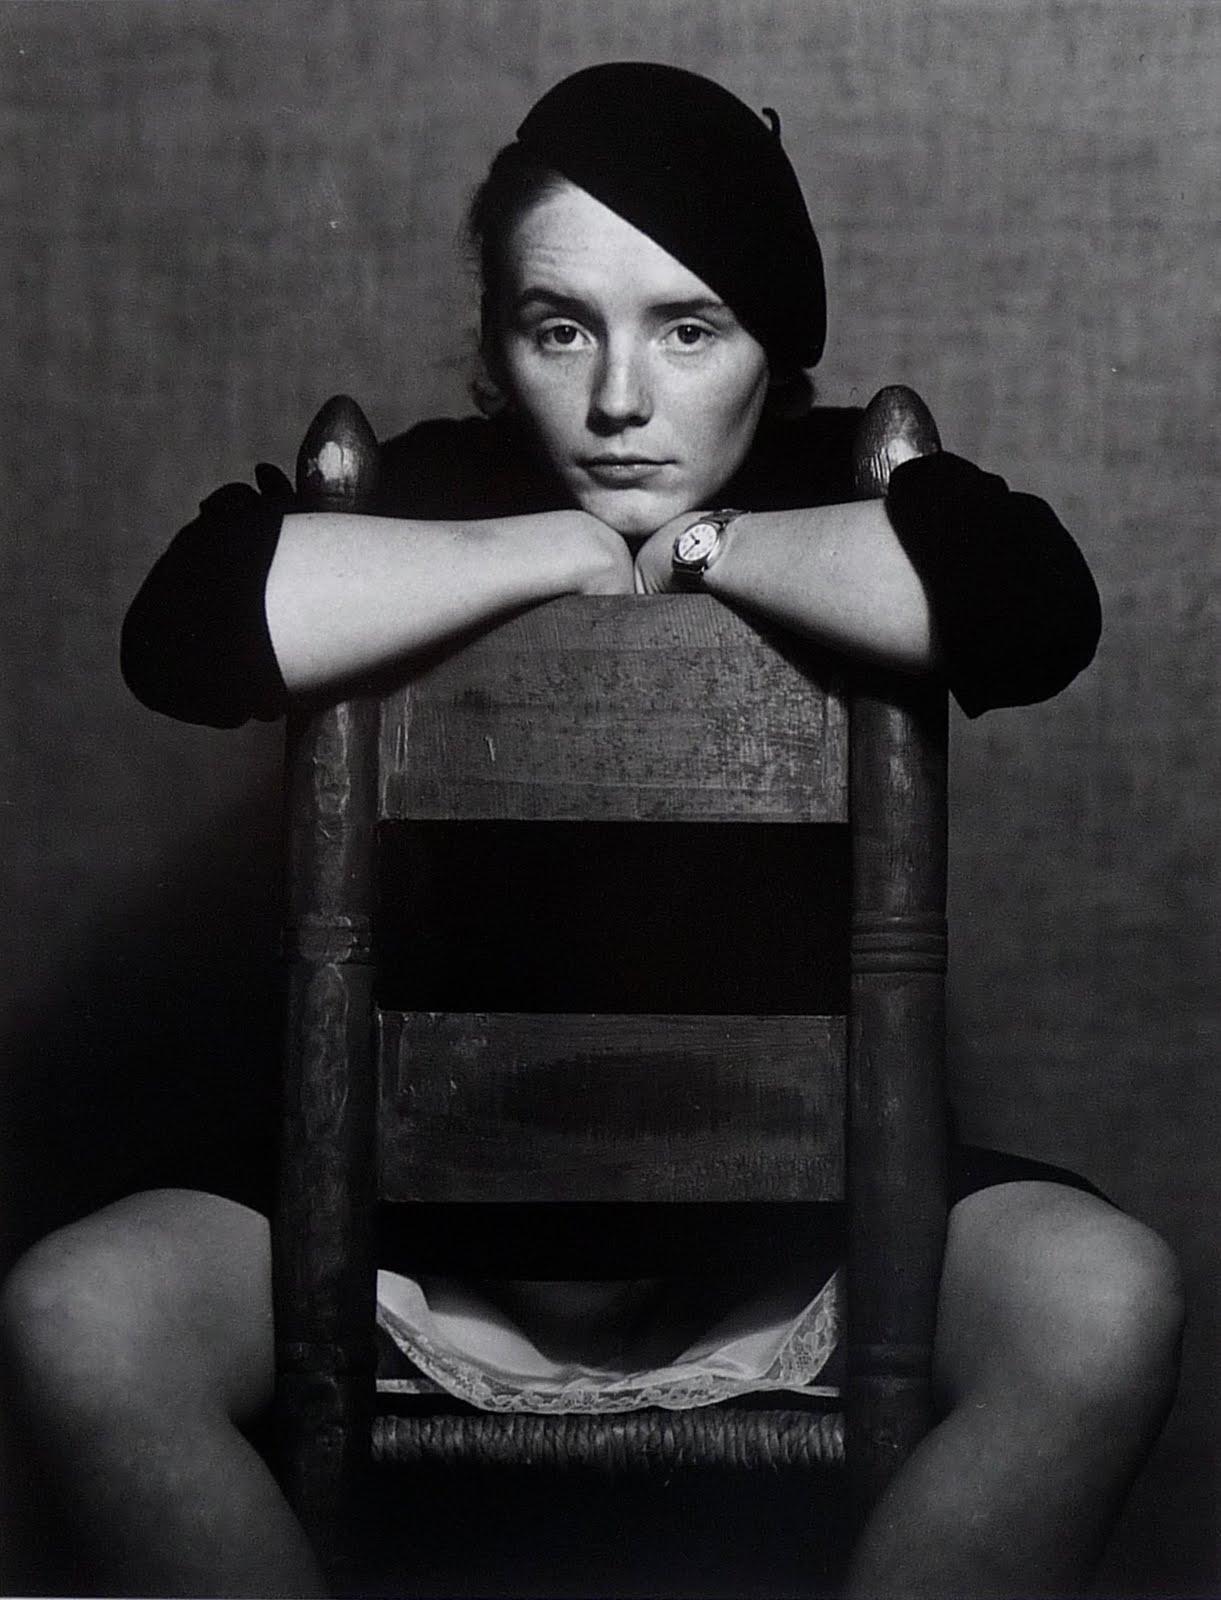 Edward weston fotografo biografia 5